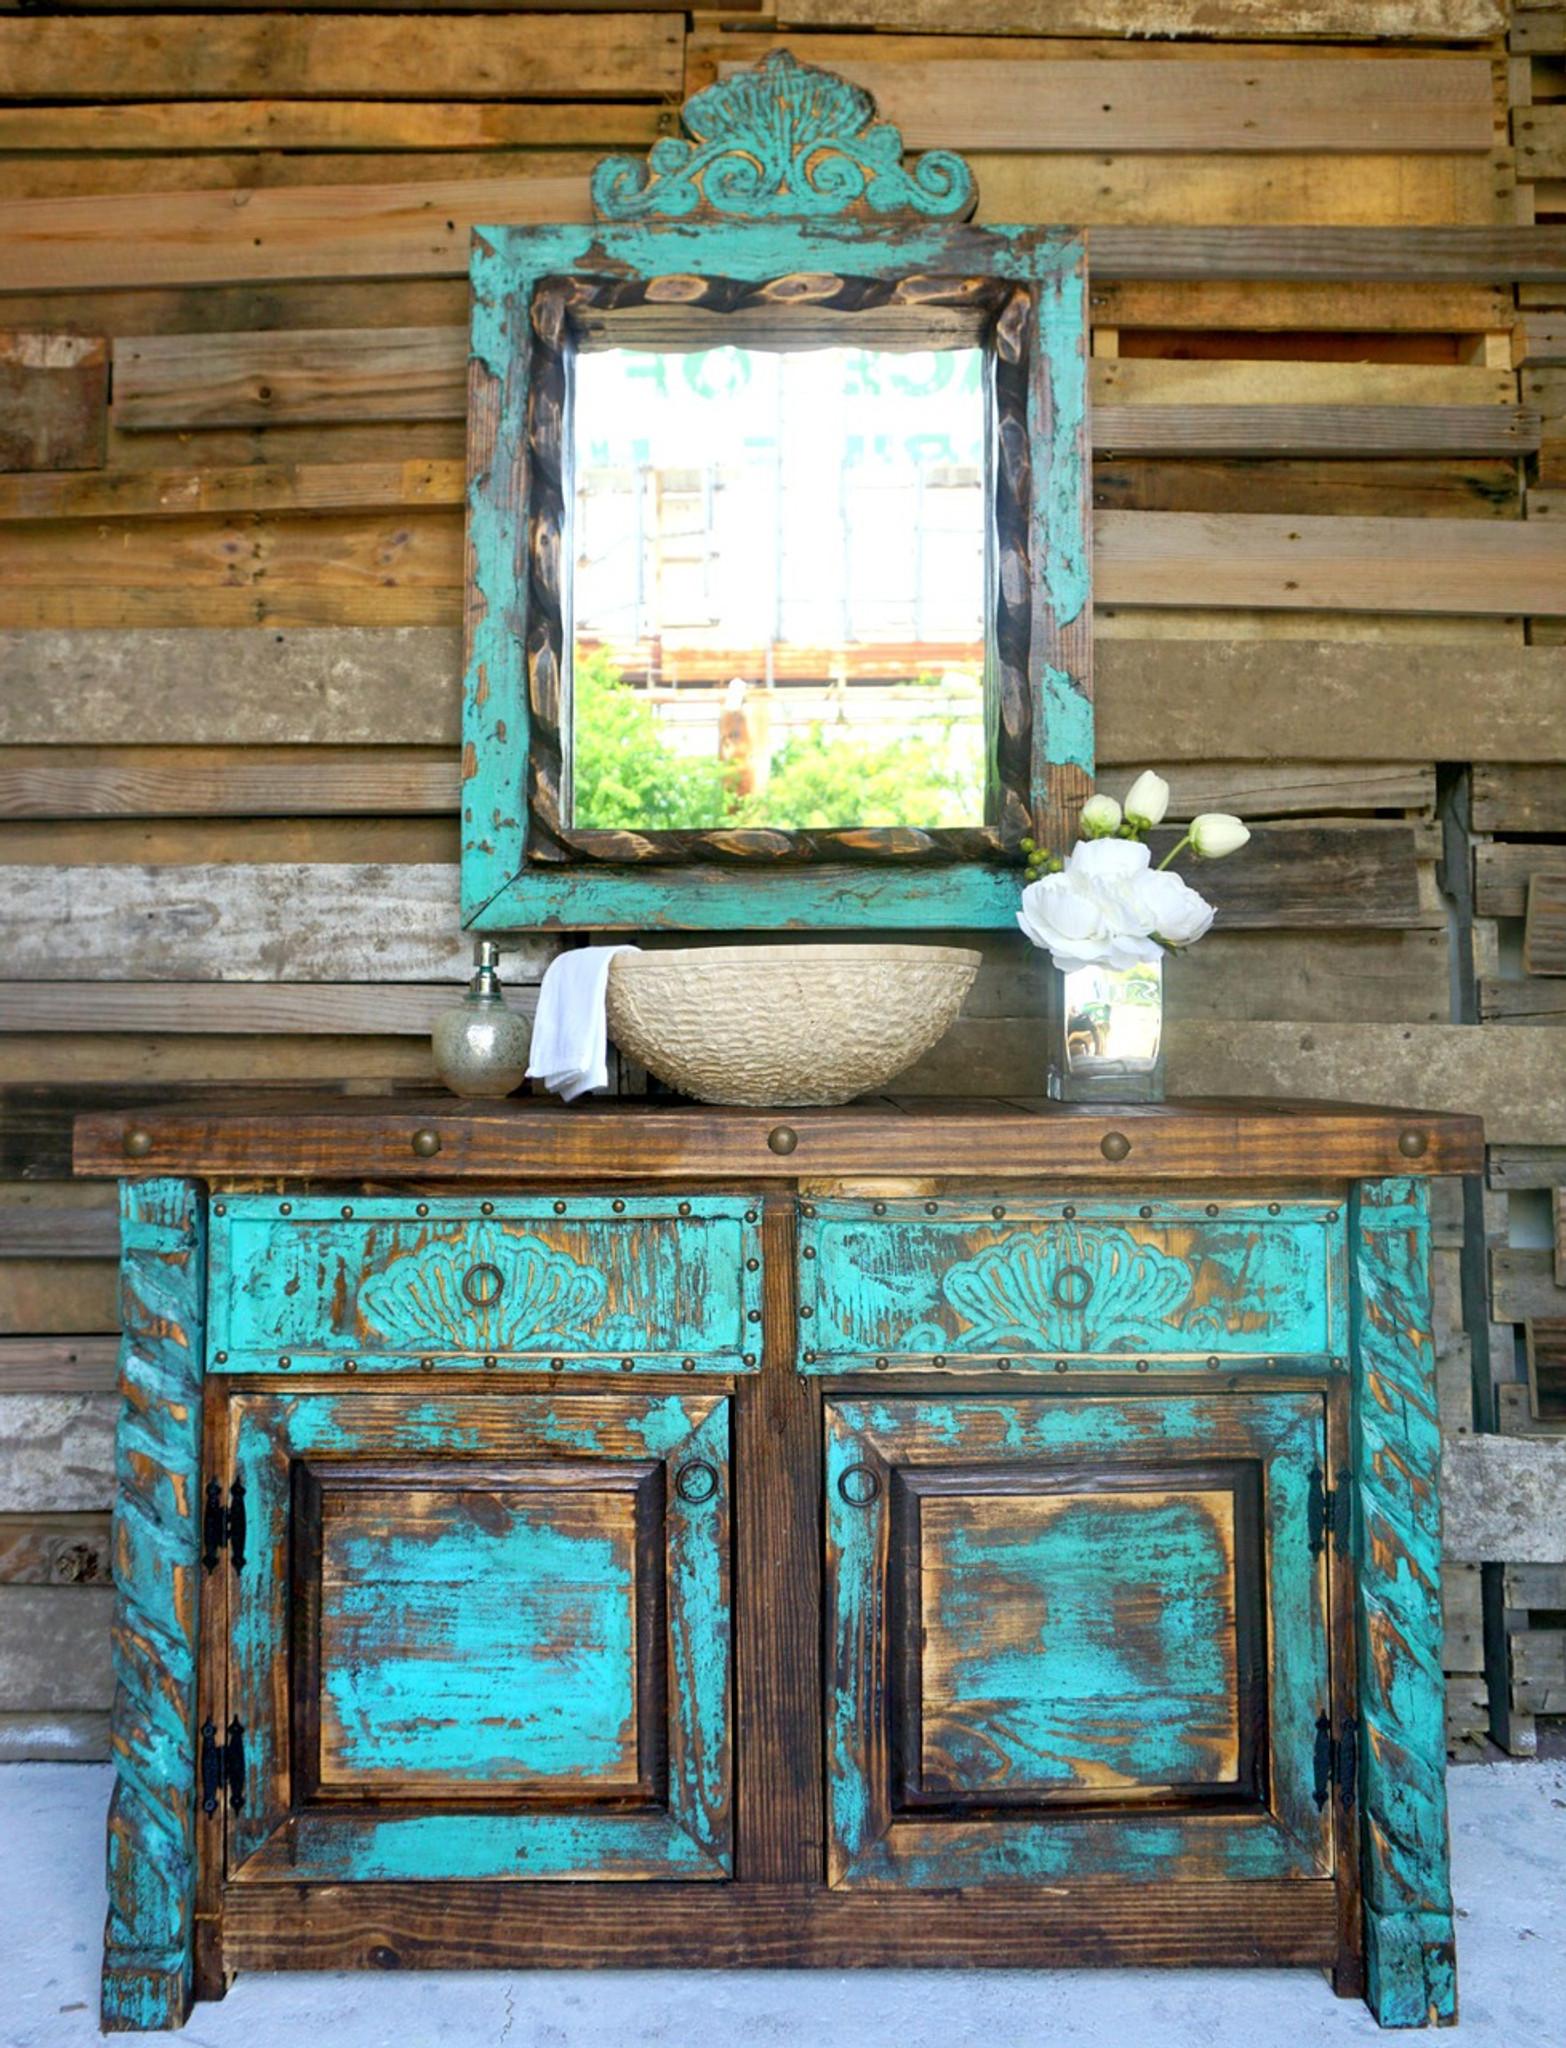 Images Of Rustic Furniture. Home · Rustic Furniture; Agave Bathroom Vanity.  Vanity Shown